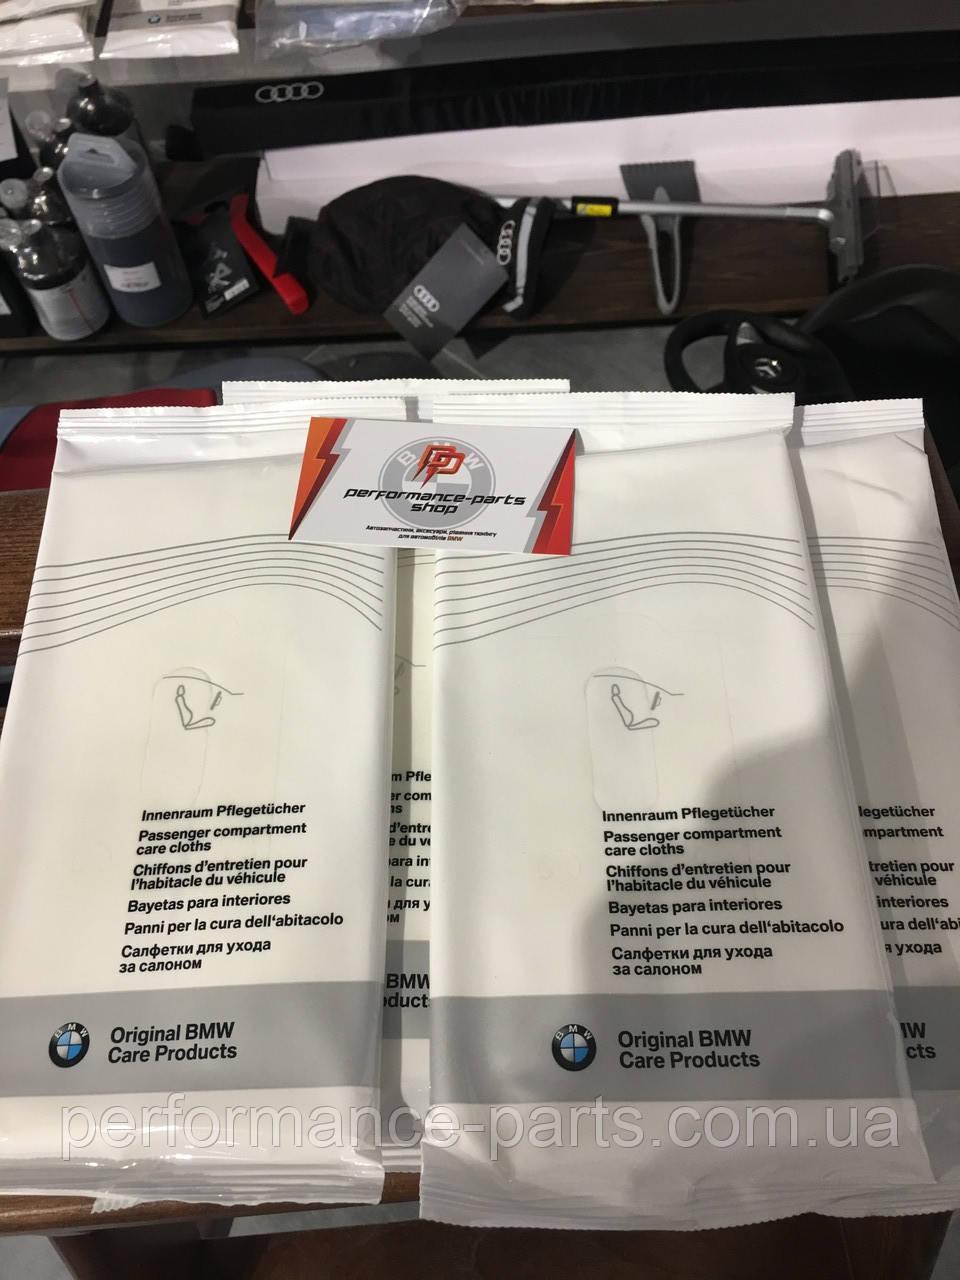 Салфетки для ухода за салоном BMW Passanger Compartment Care Cloths, 83122298226. Оригинал.